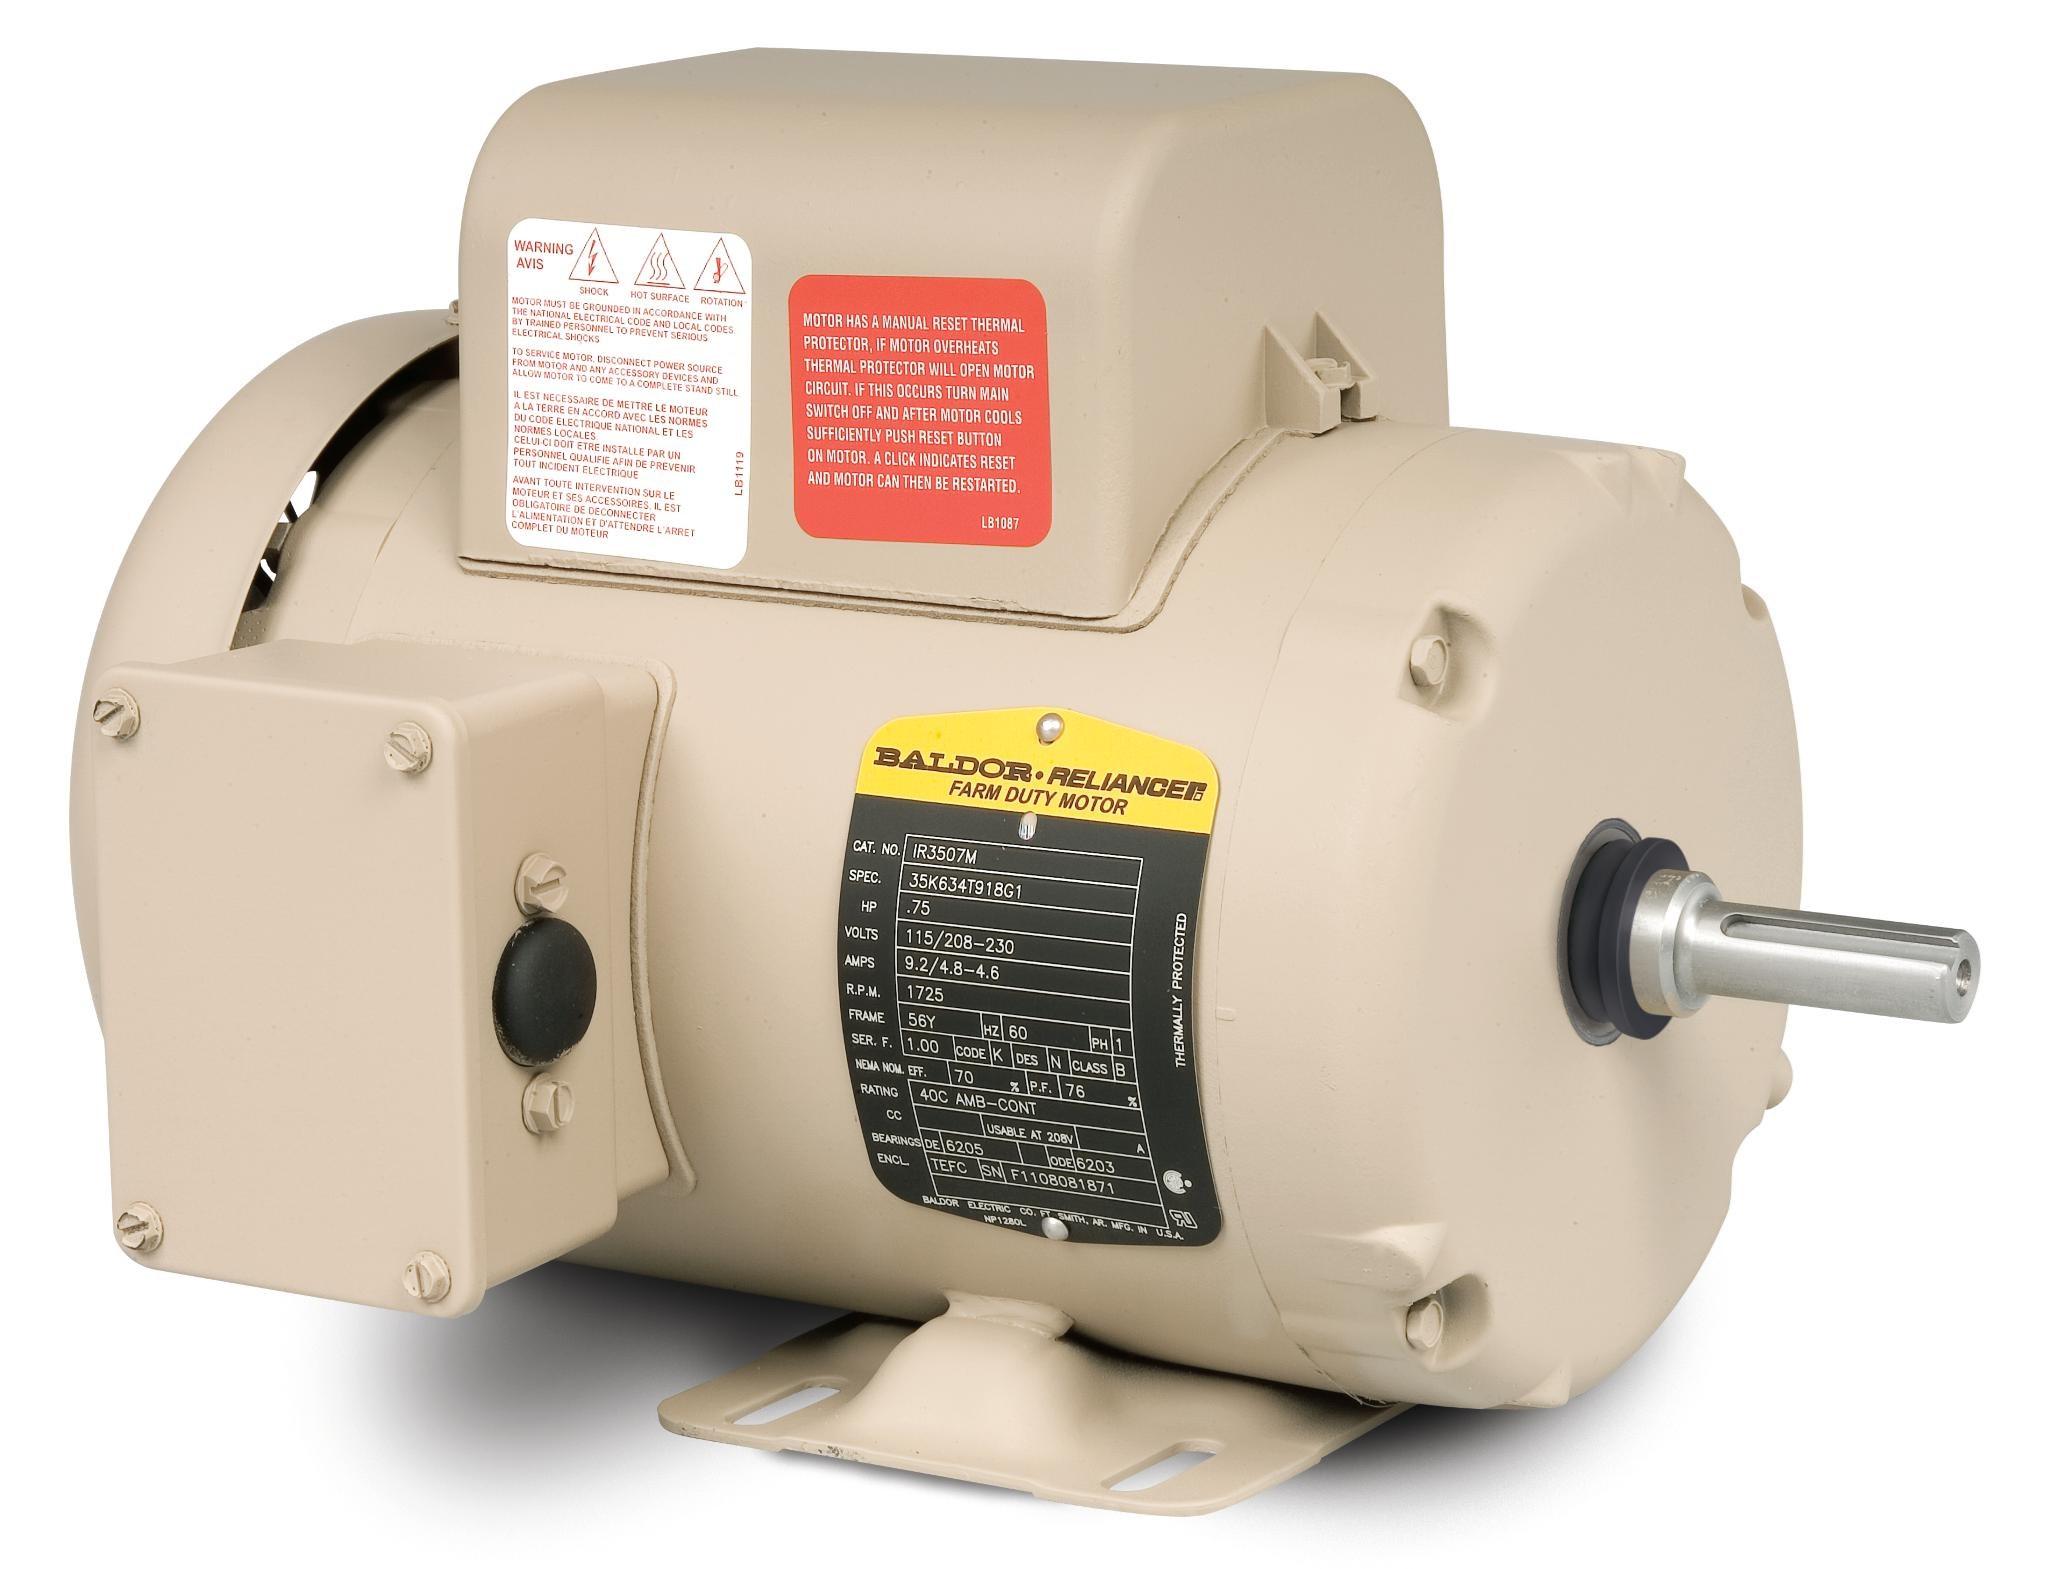 213t Electric Motor 1 Phase Farm Duty Wiring Diagram 52 Motors On Baldor 5 Hp Single 39 Com Imagebcwhiteas1h256w256 At